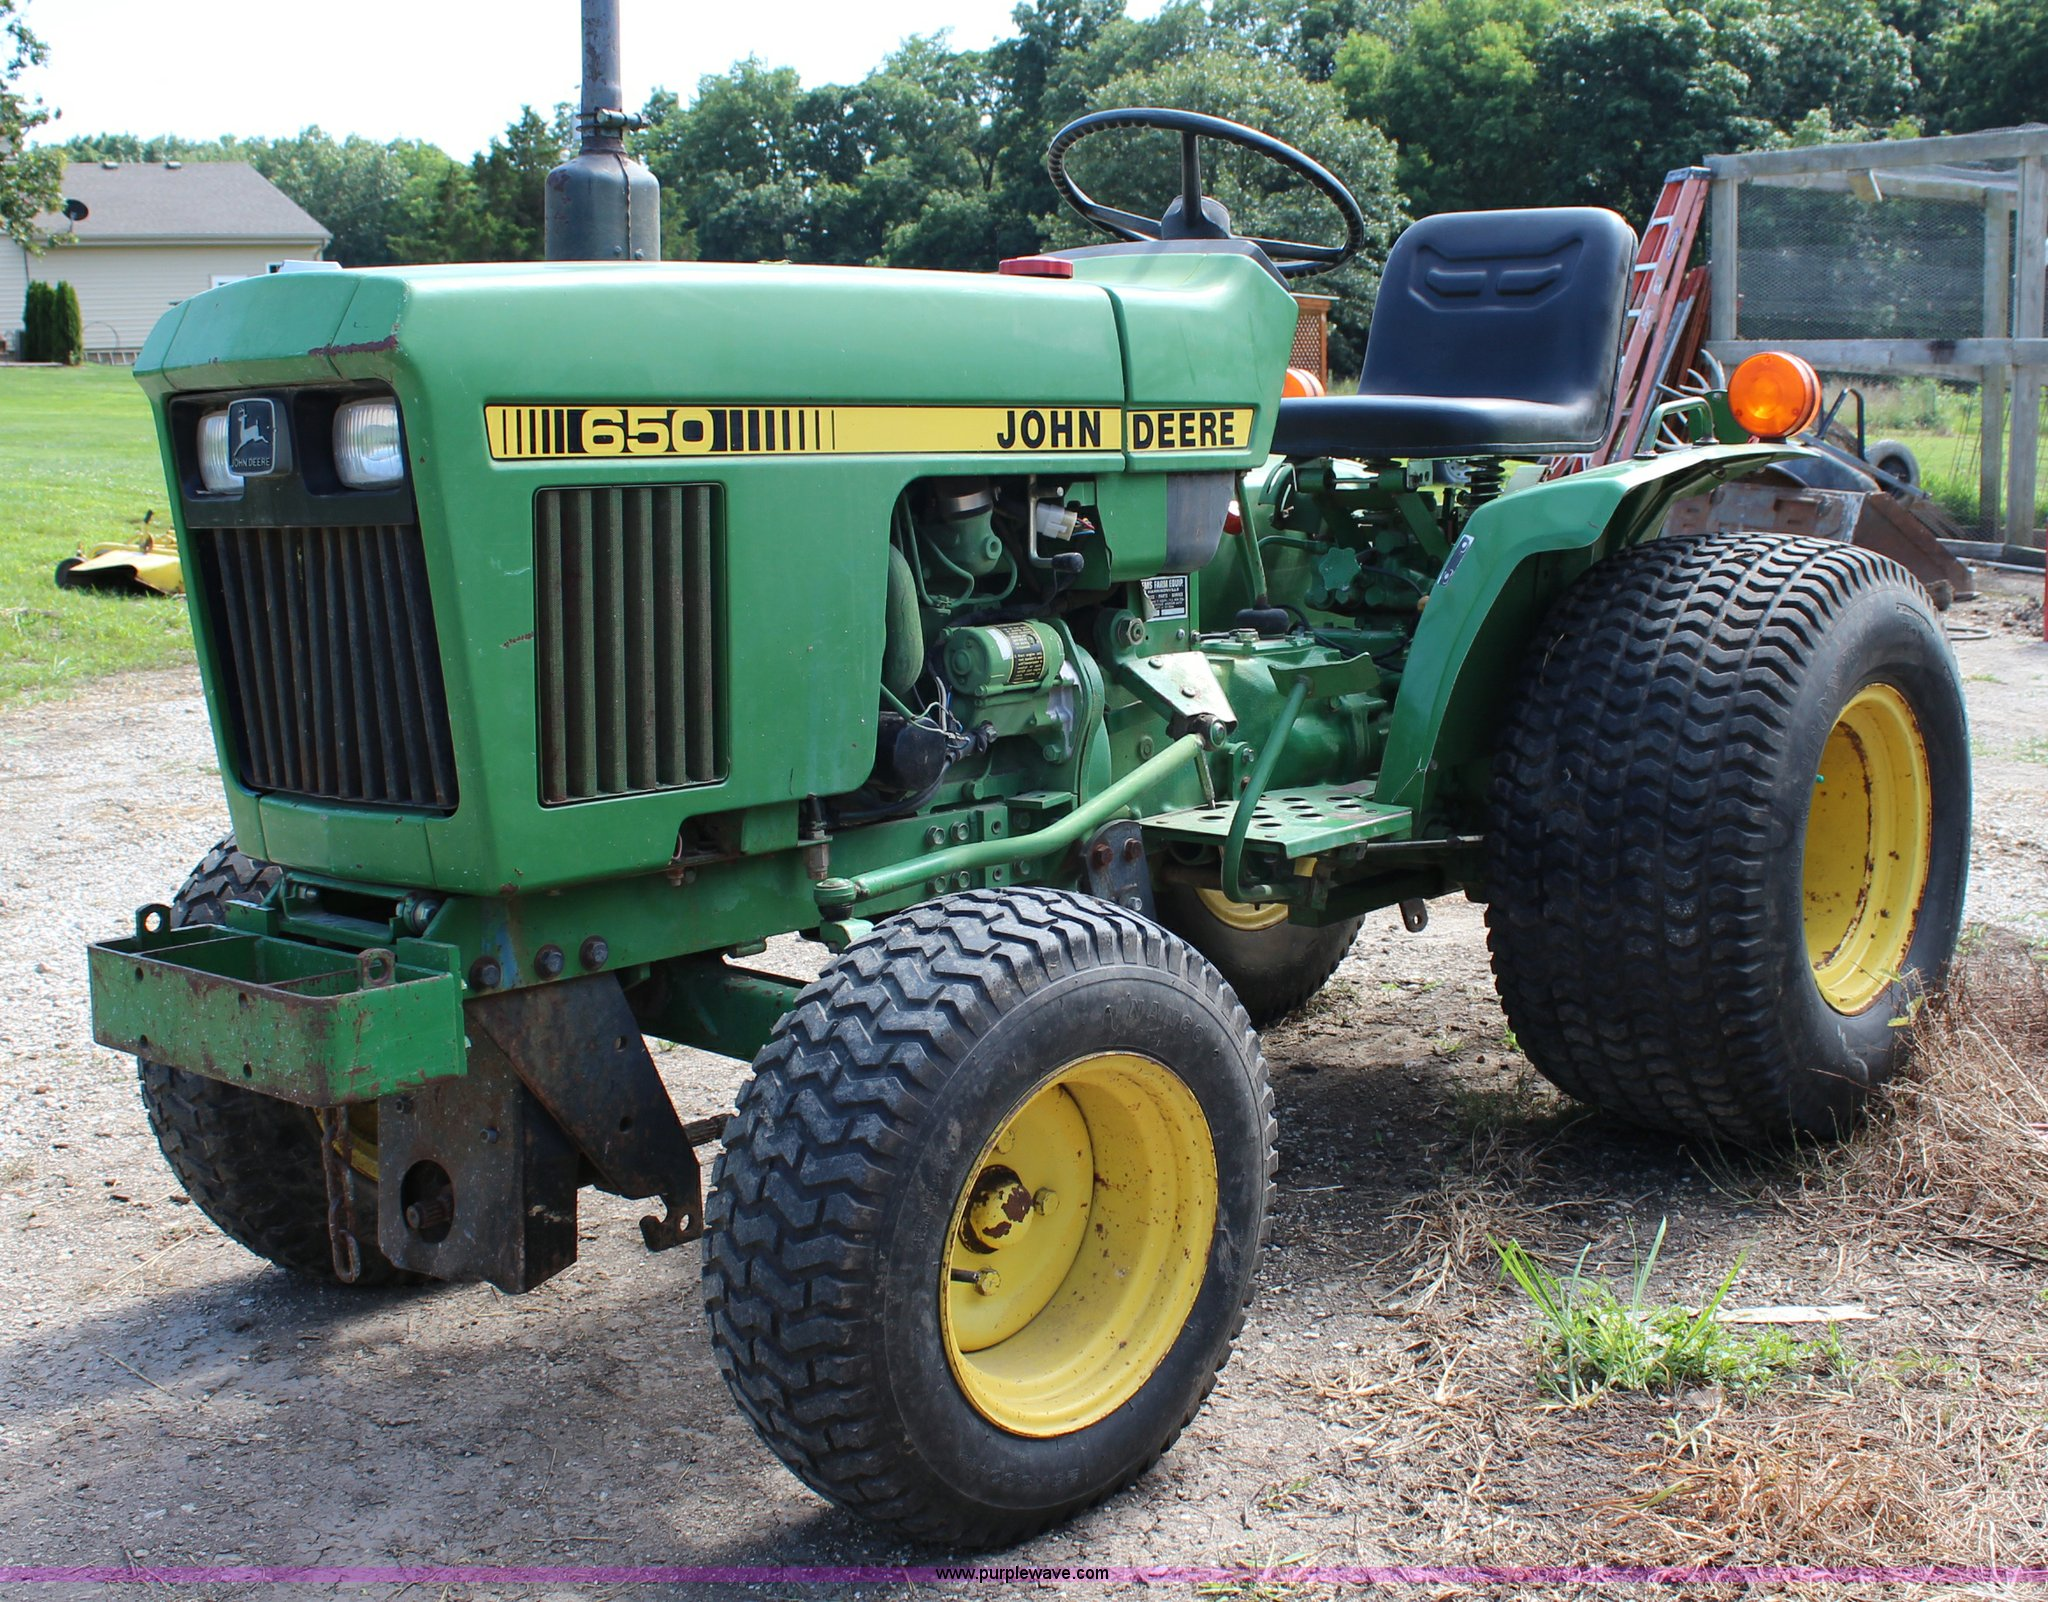 John Deere 650 >> John Deere 650 Utility Tractor Item J5891 Sold August 1